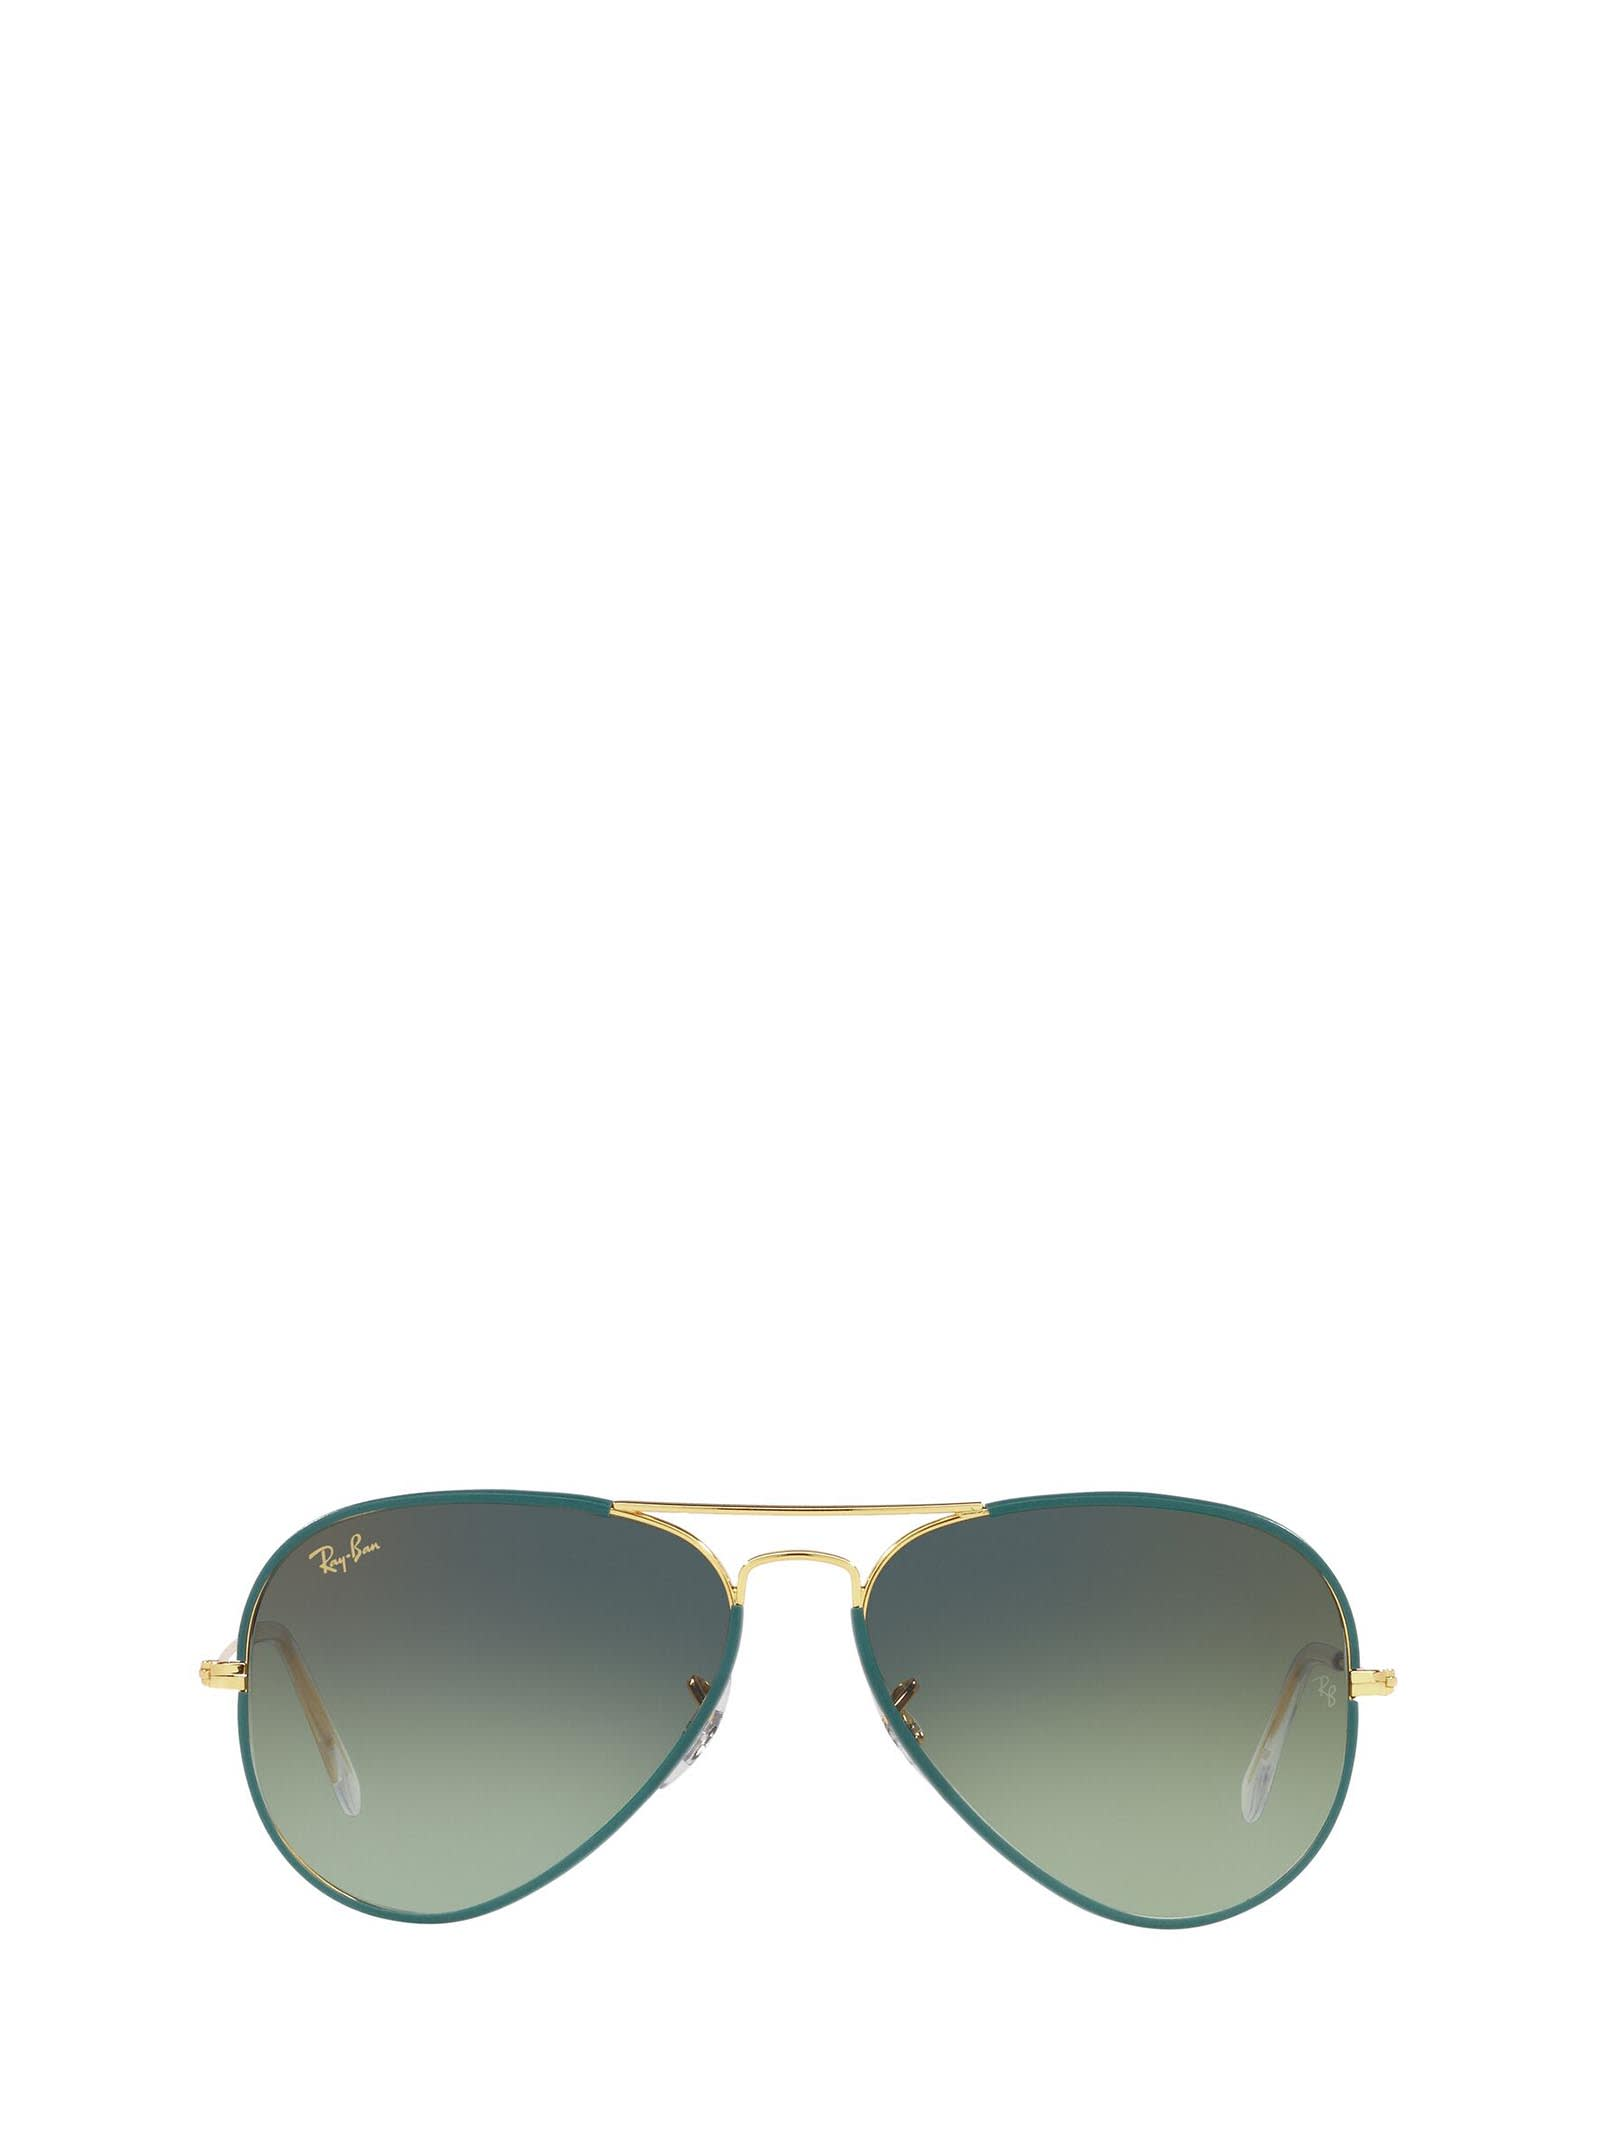 Ray-Ban Ray-ban Rb3025jm Petroleum On Legend Gold Sunglasses